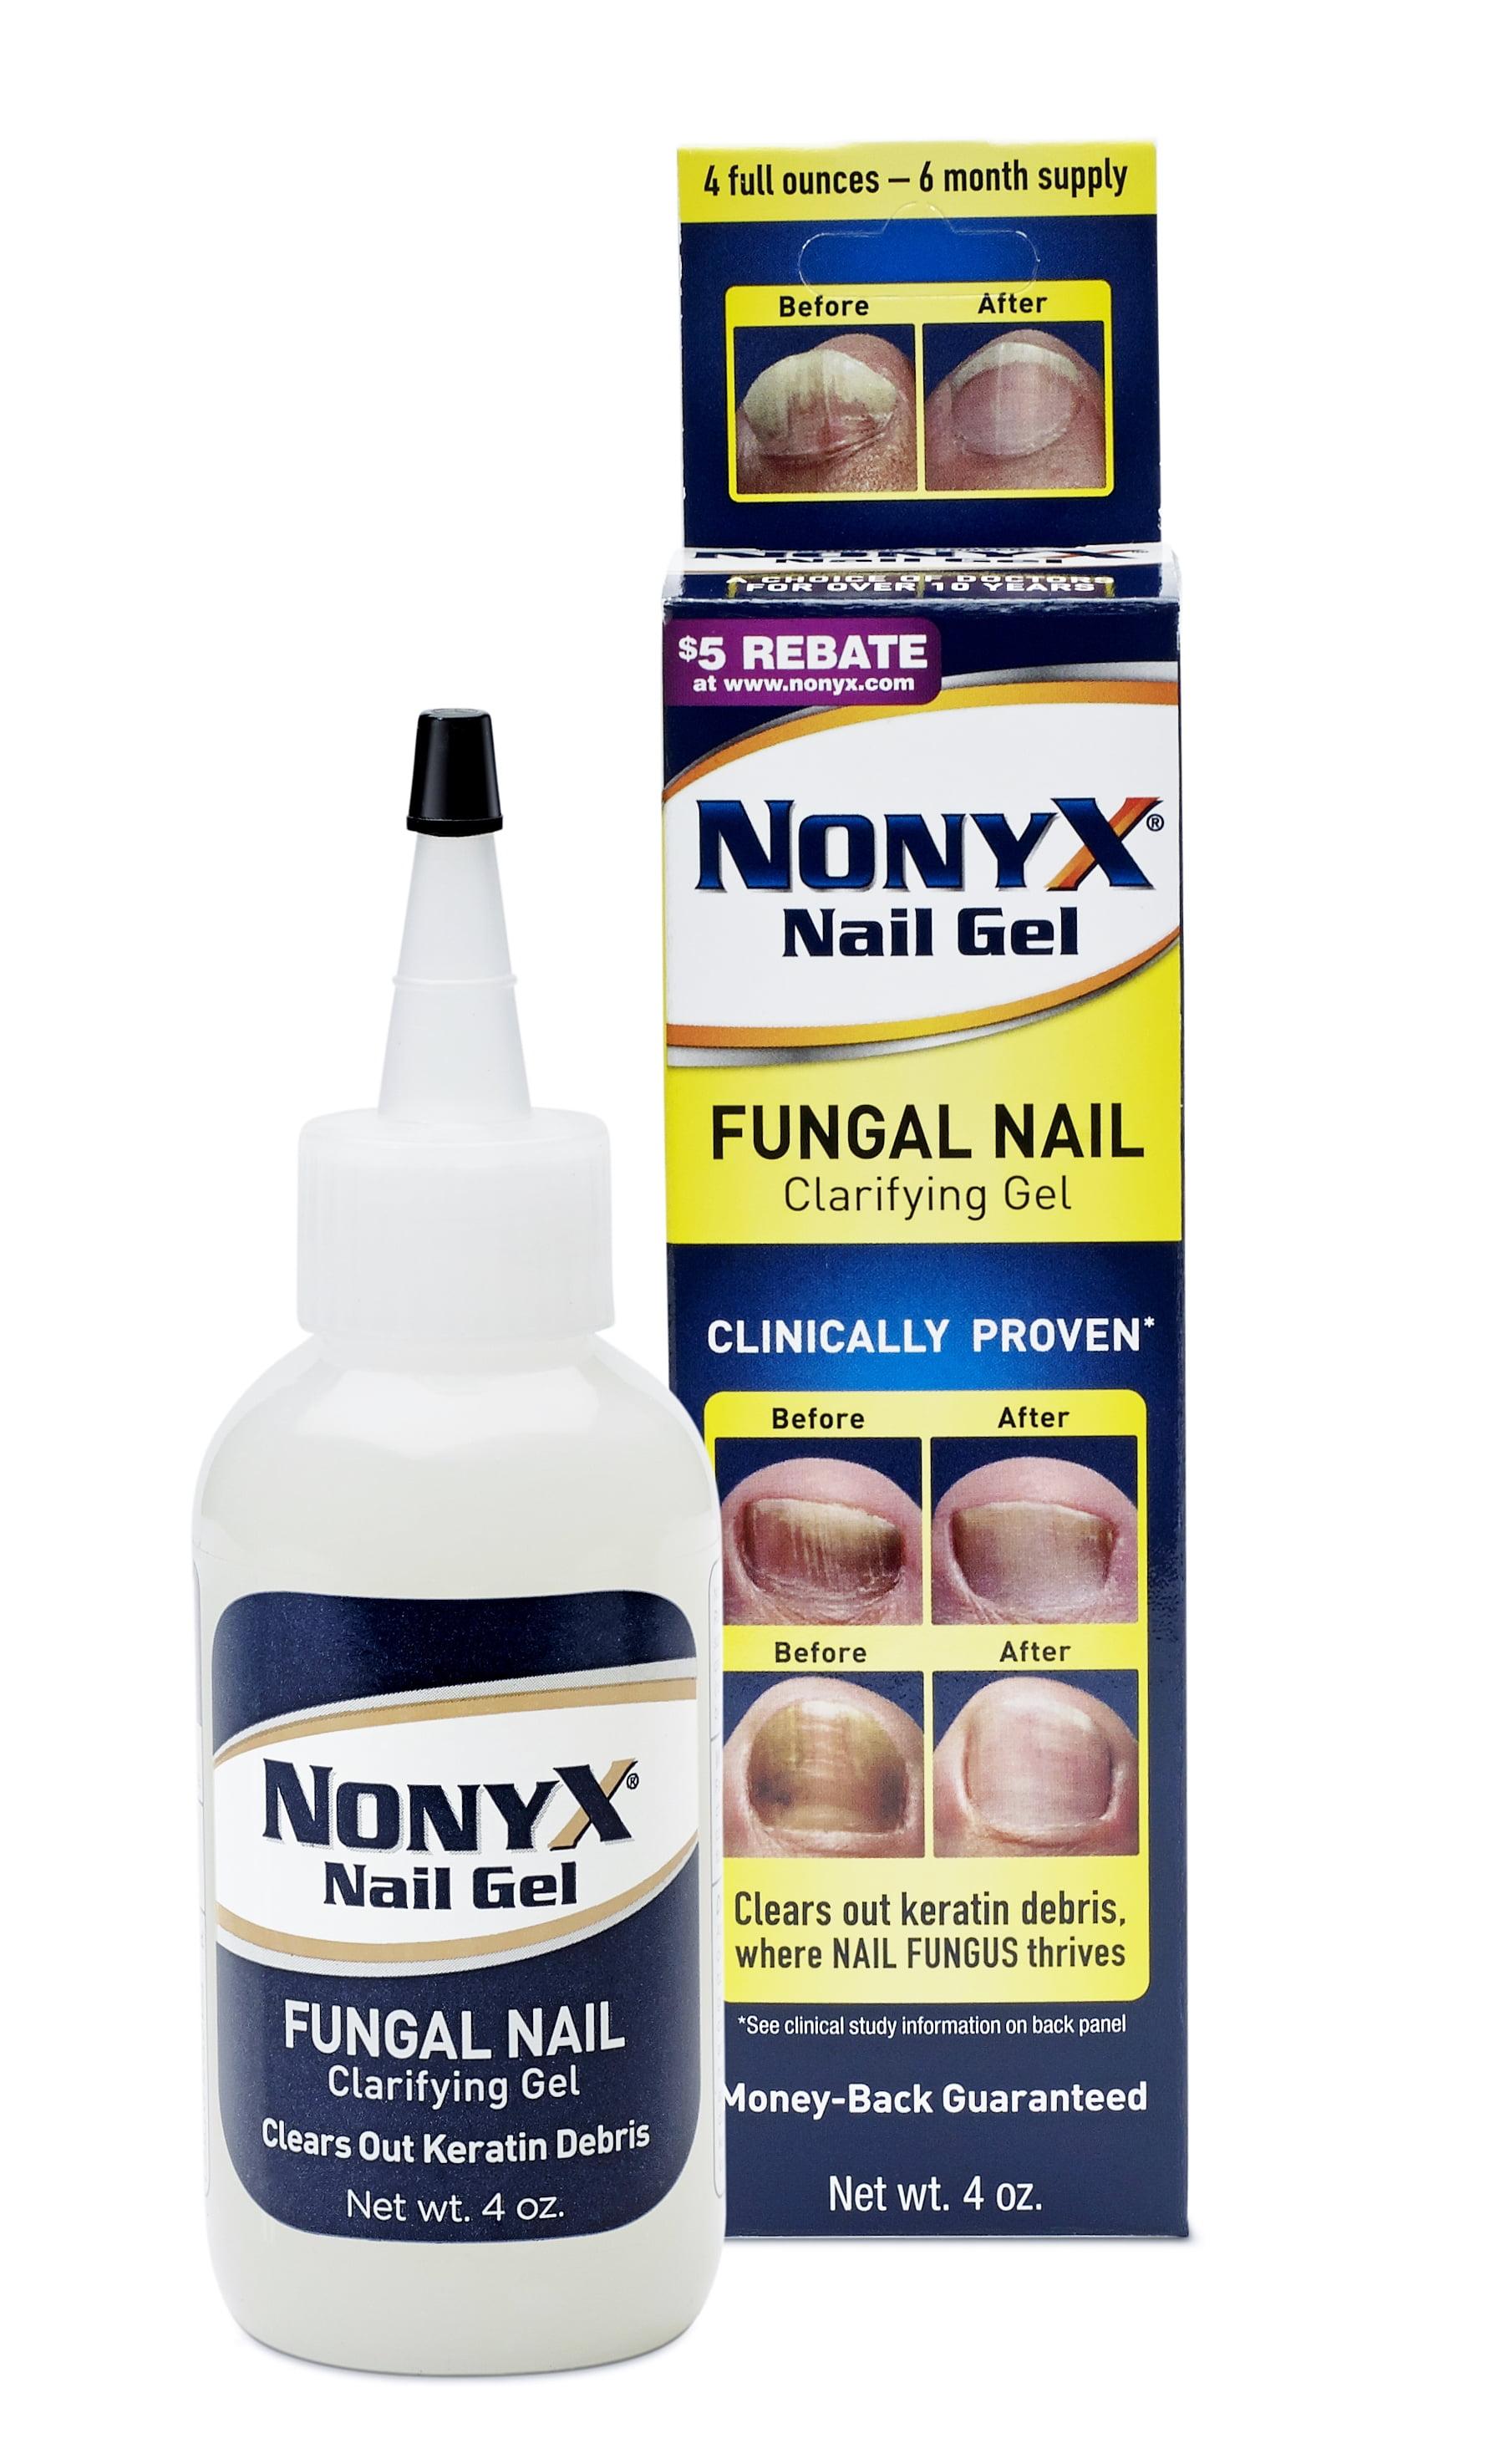 Nonyx Fungal Nail Clarifying Gel - Walmart.com